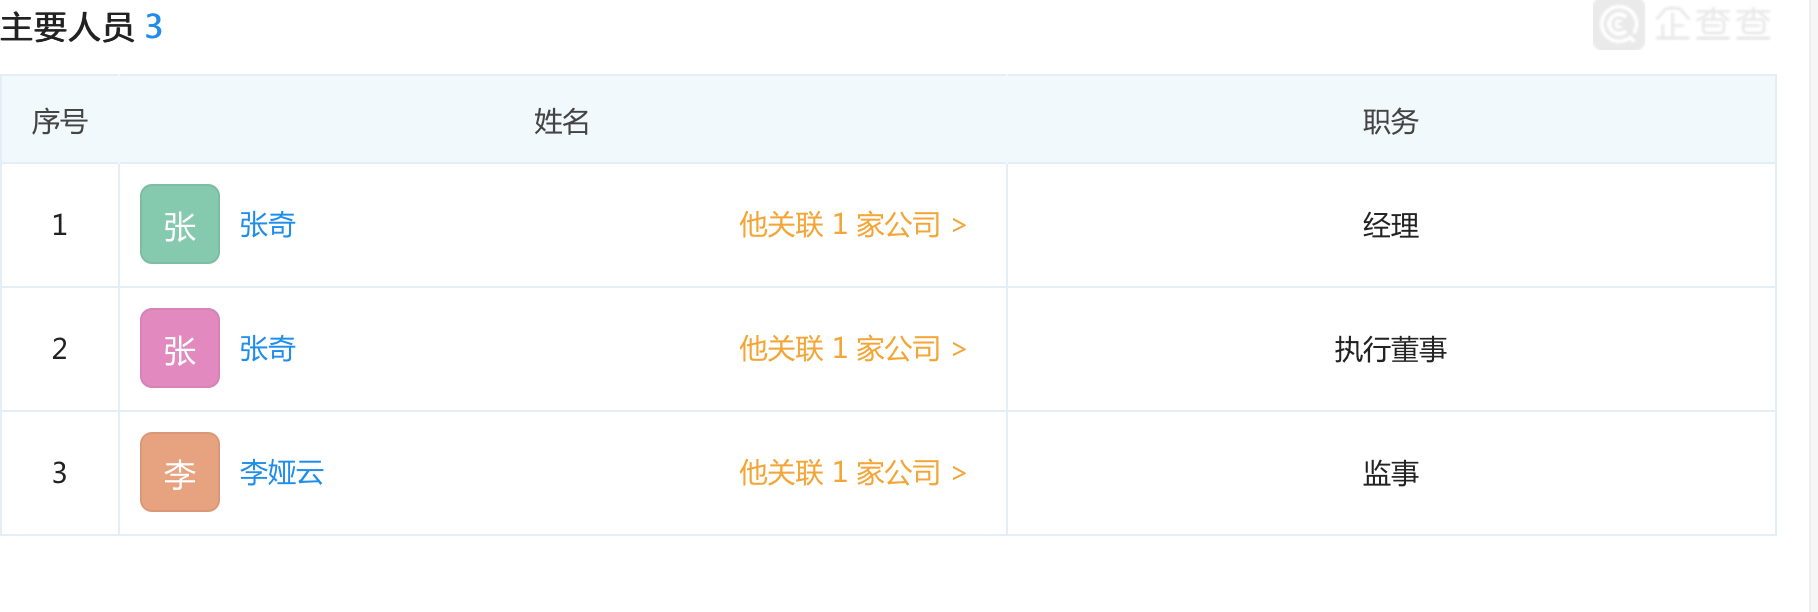 屏幕快照 2019-04-09 下午9.37.37.png